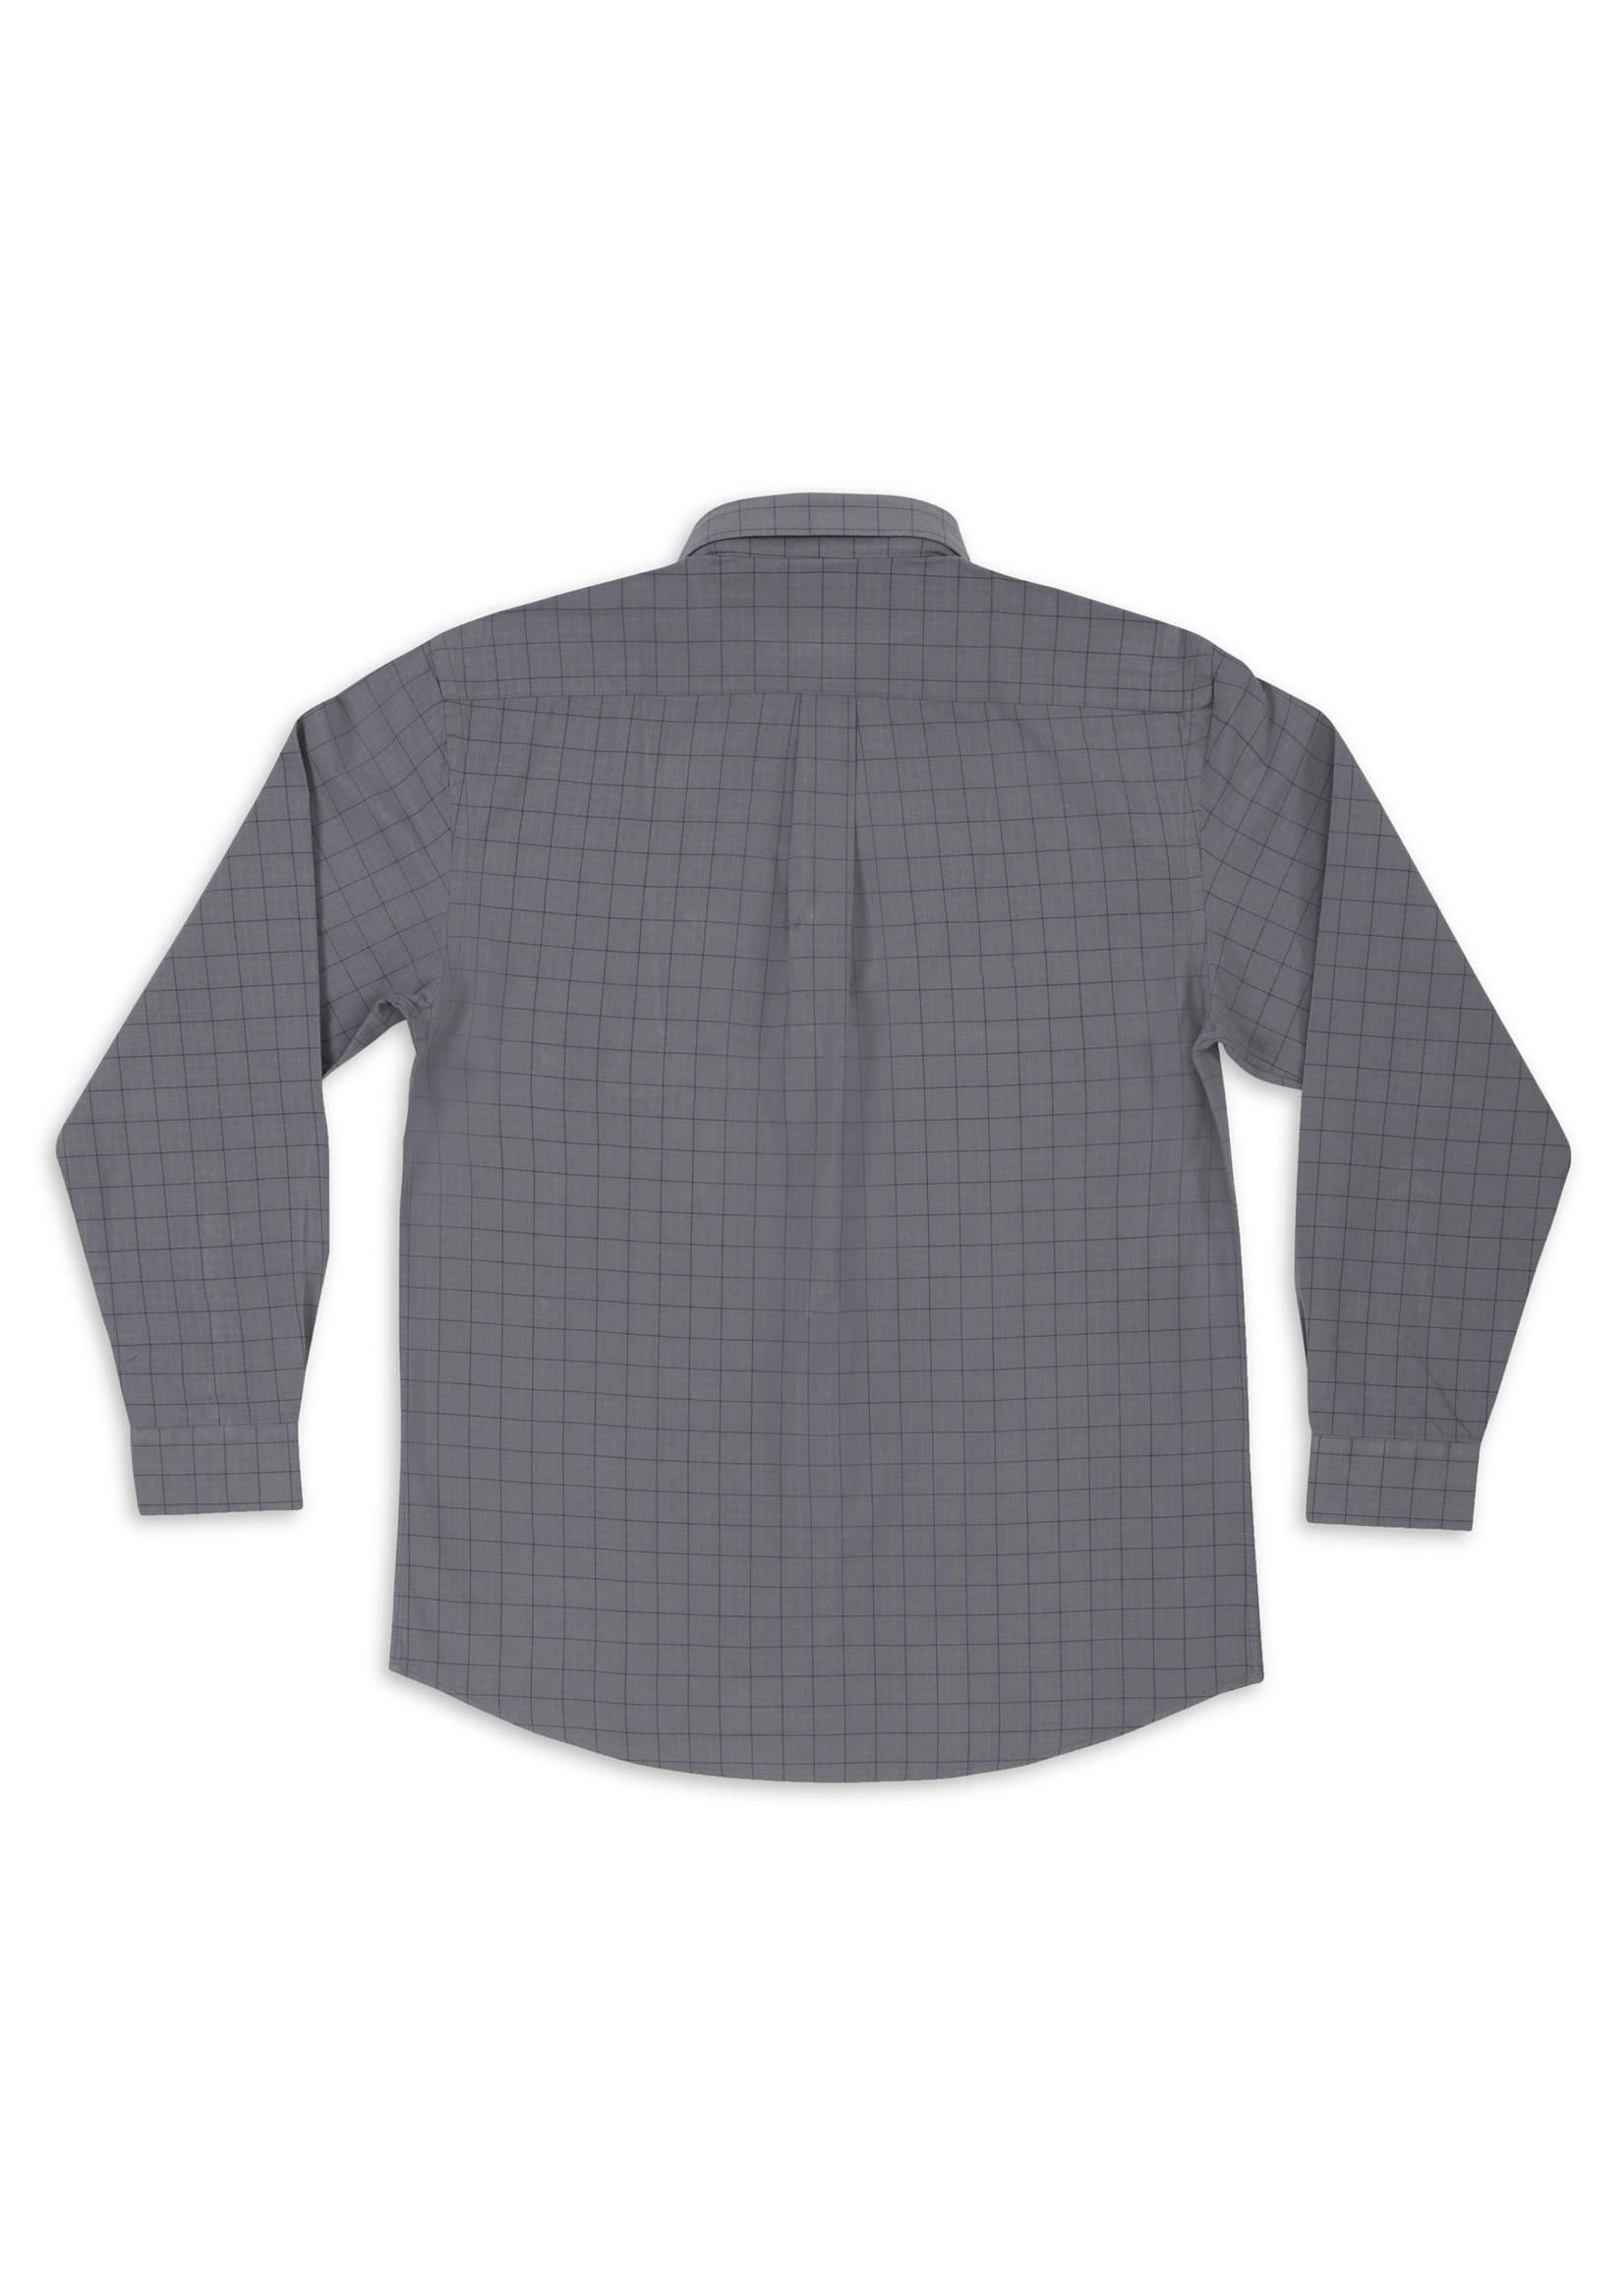 Southern Marsh Sabine Washed Check Dress Shirt